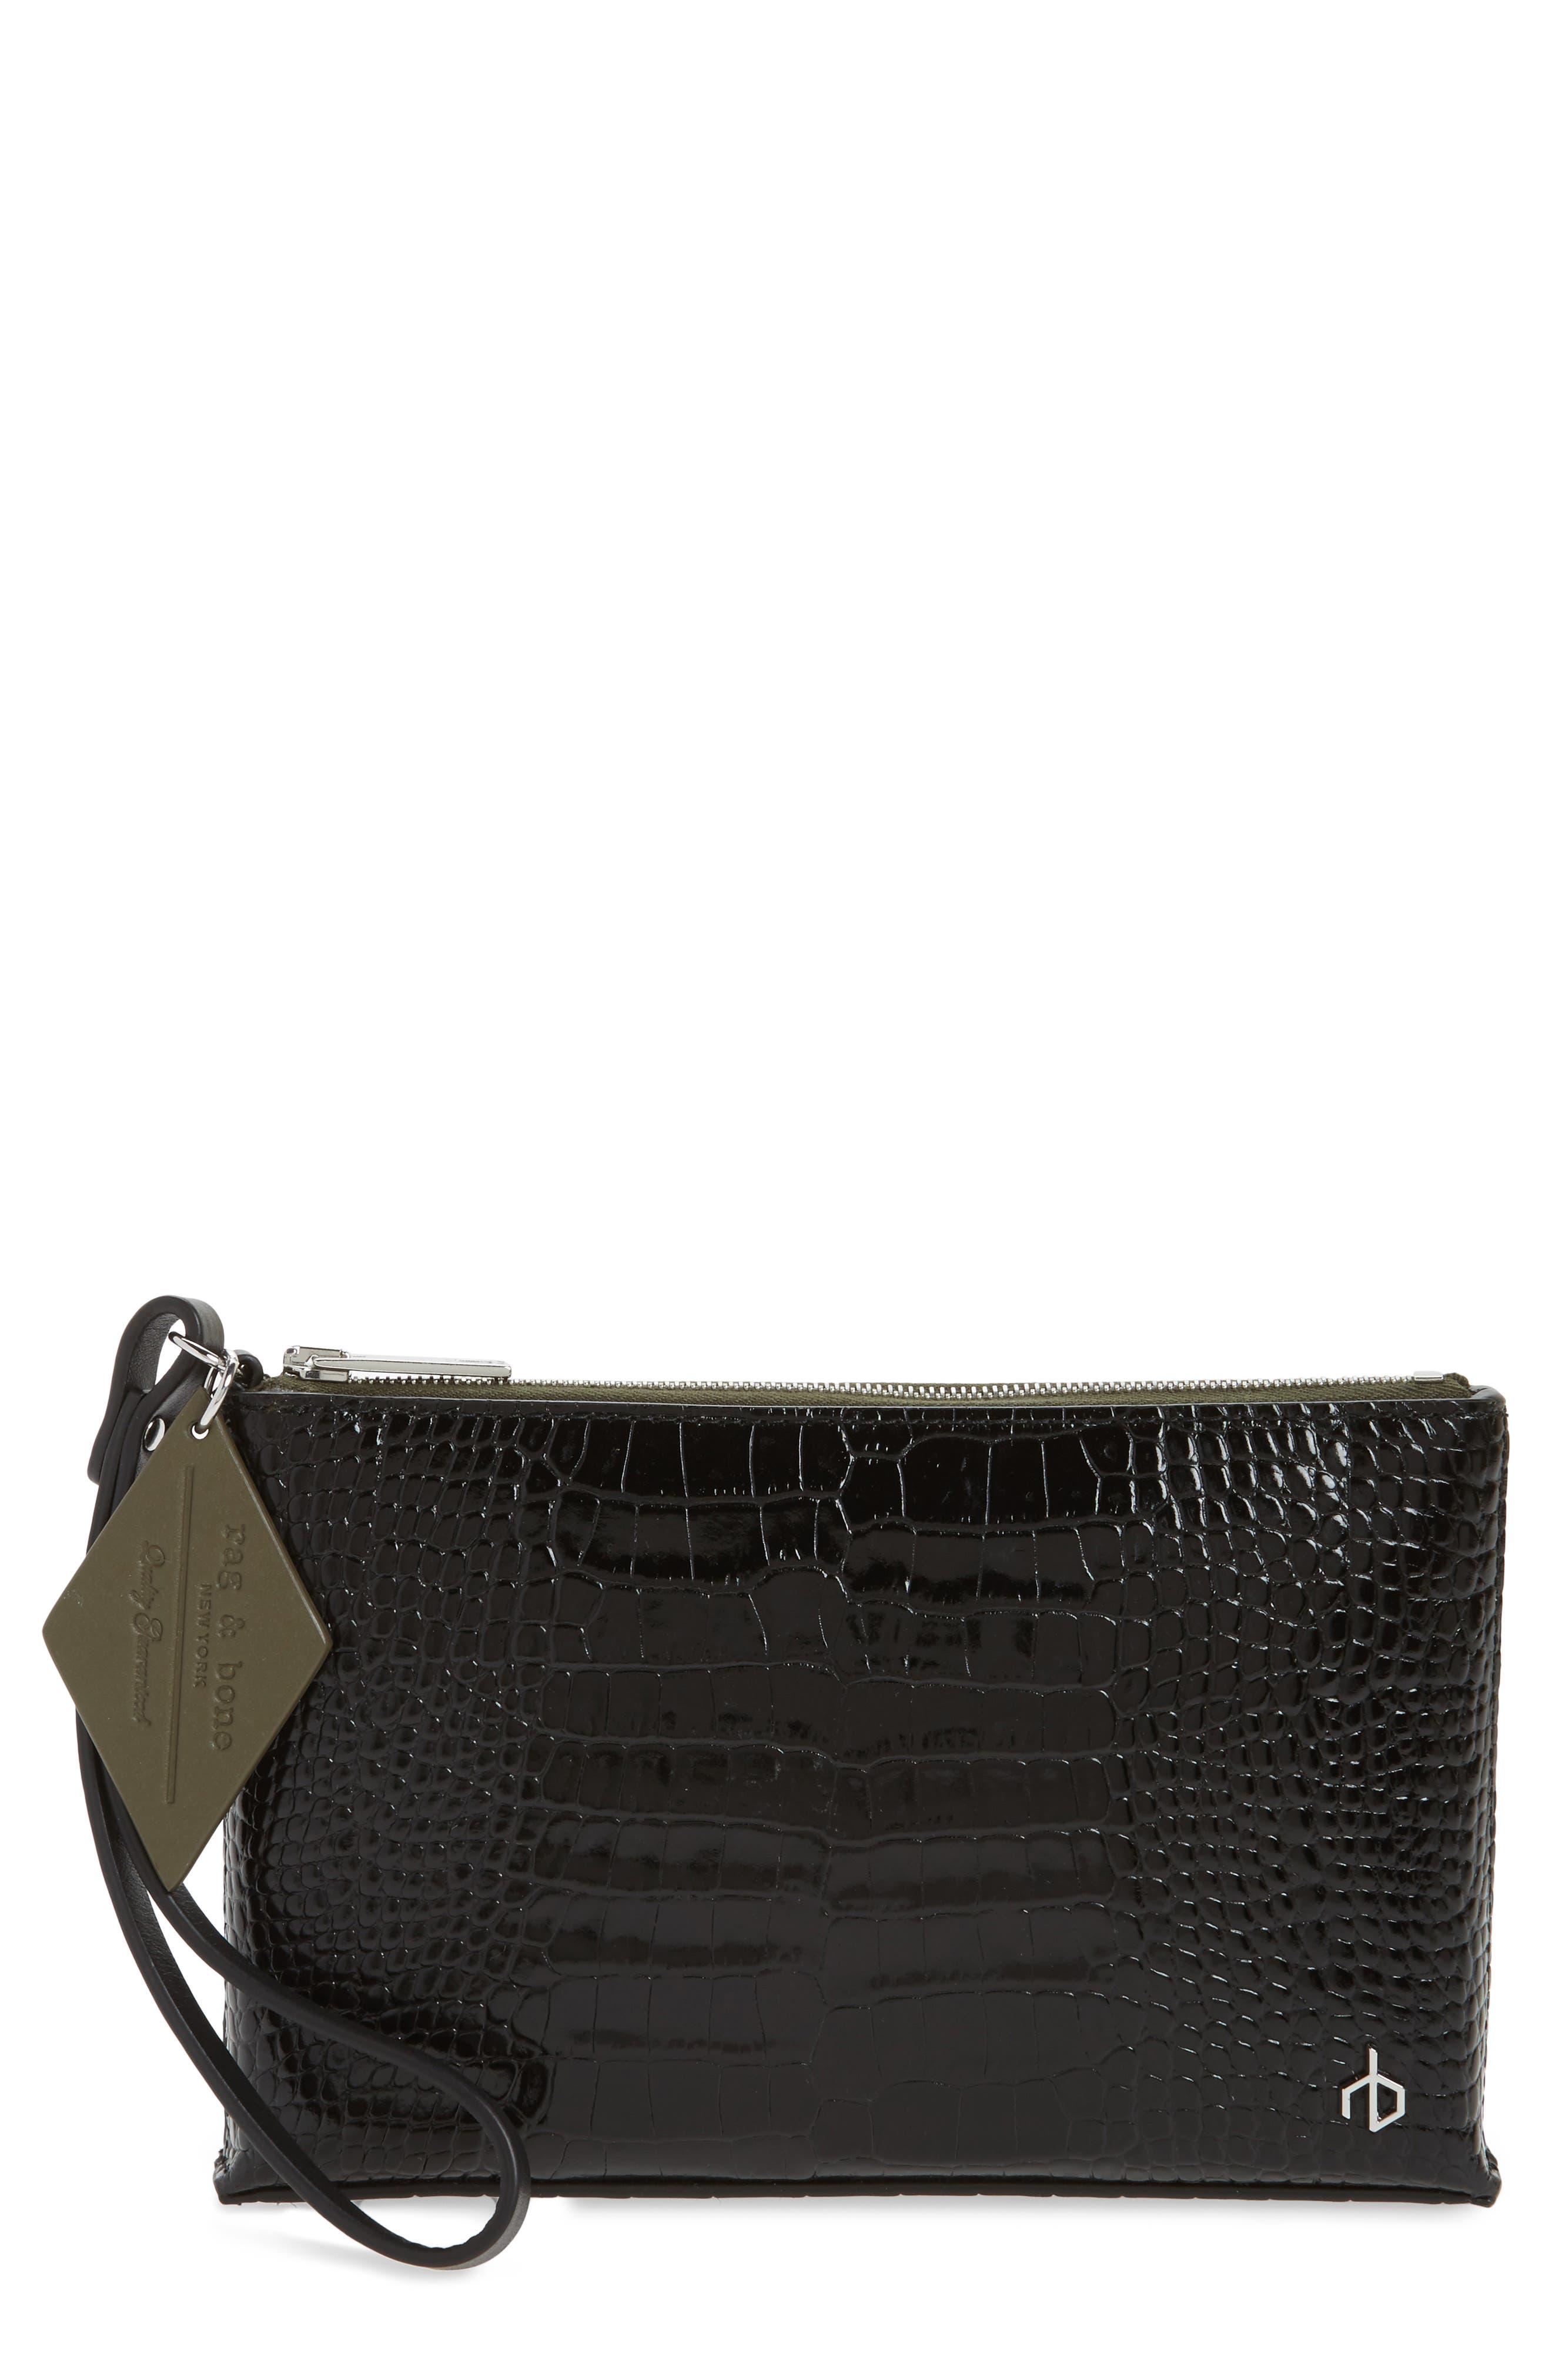 Croc Embossed Leather Wristlet,                             Main thumbnail 1, color,                             BLACK CROCO